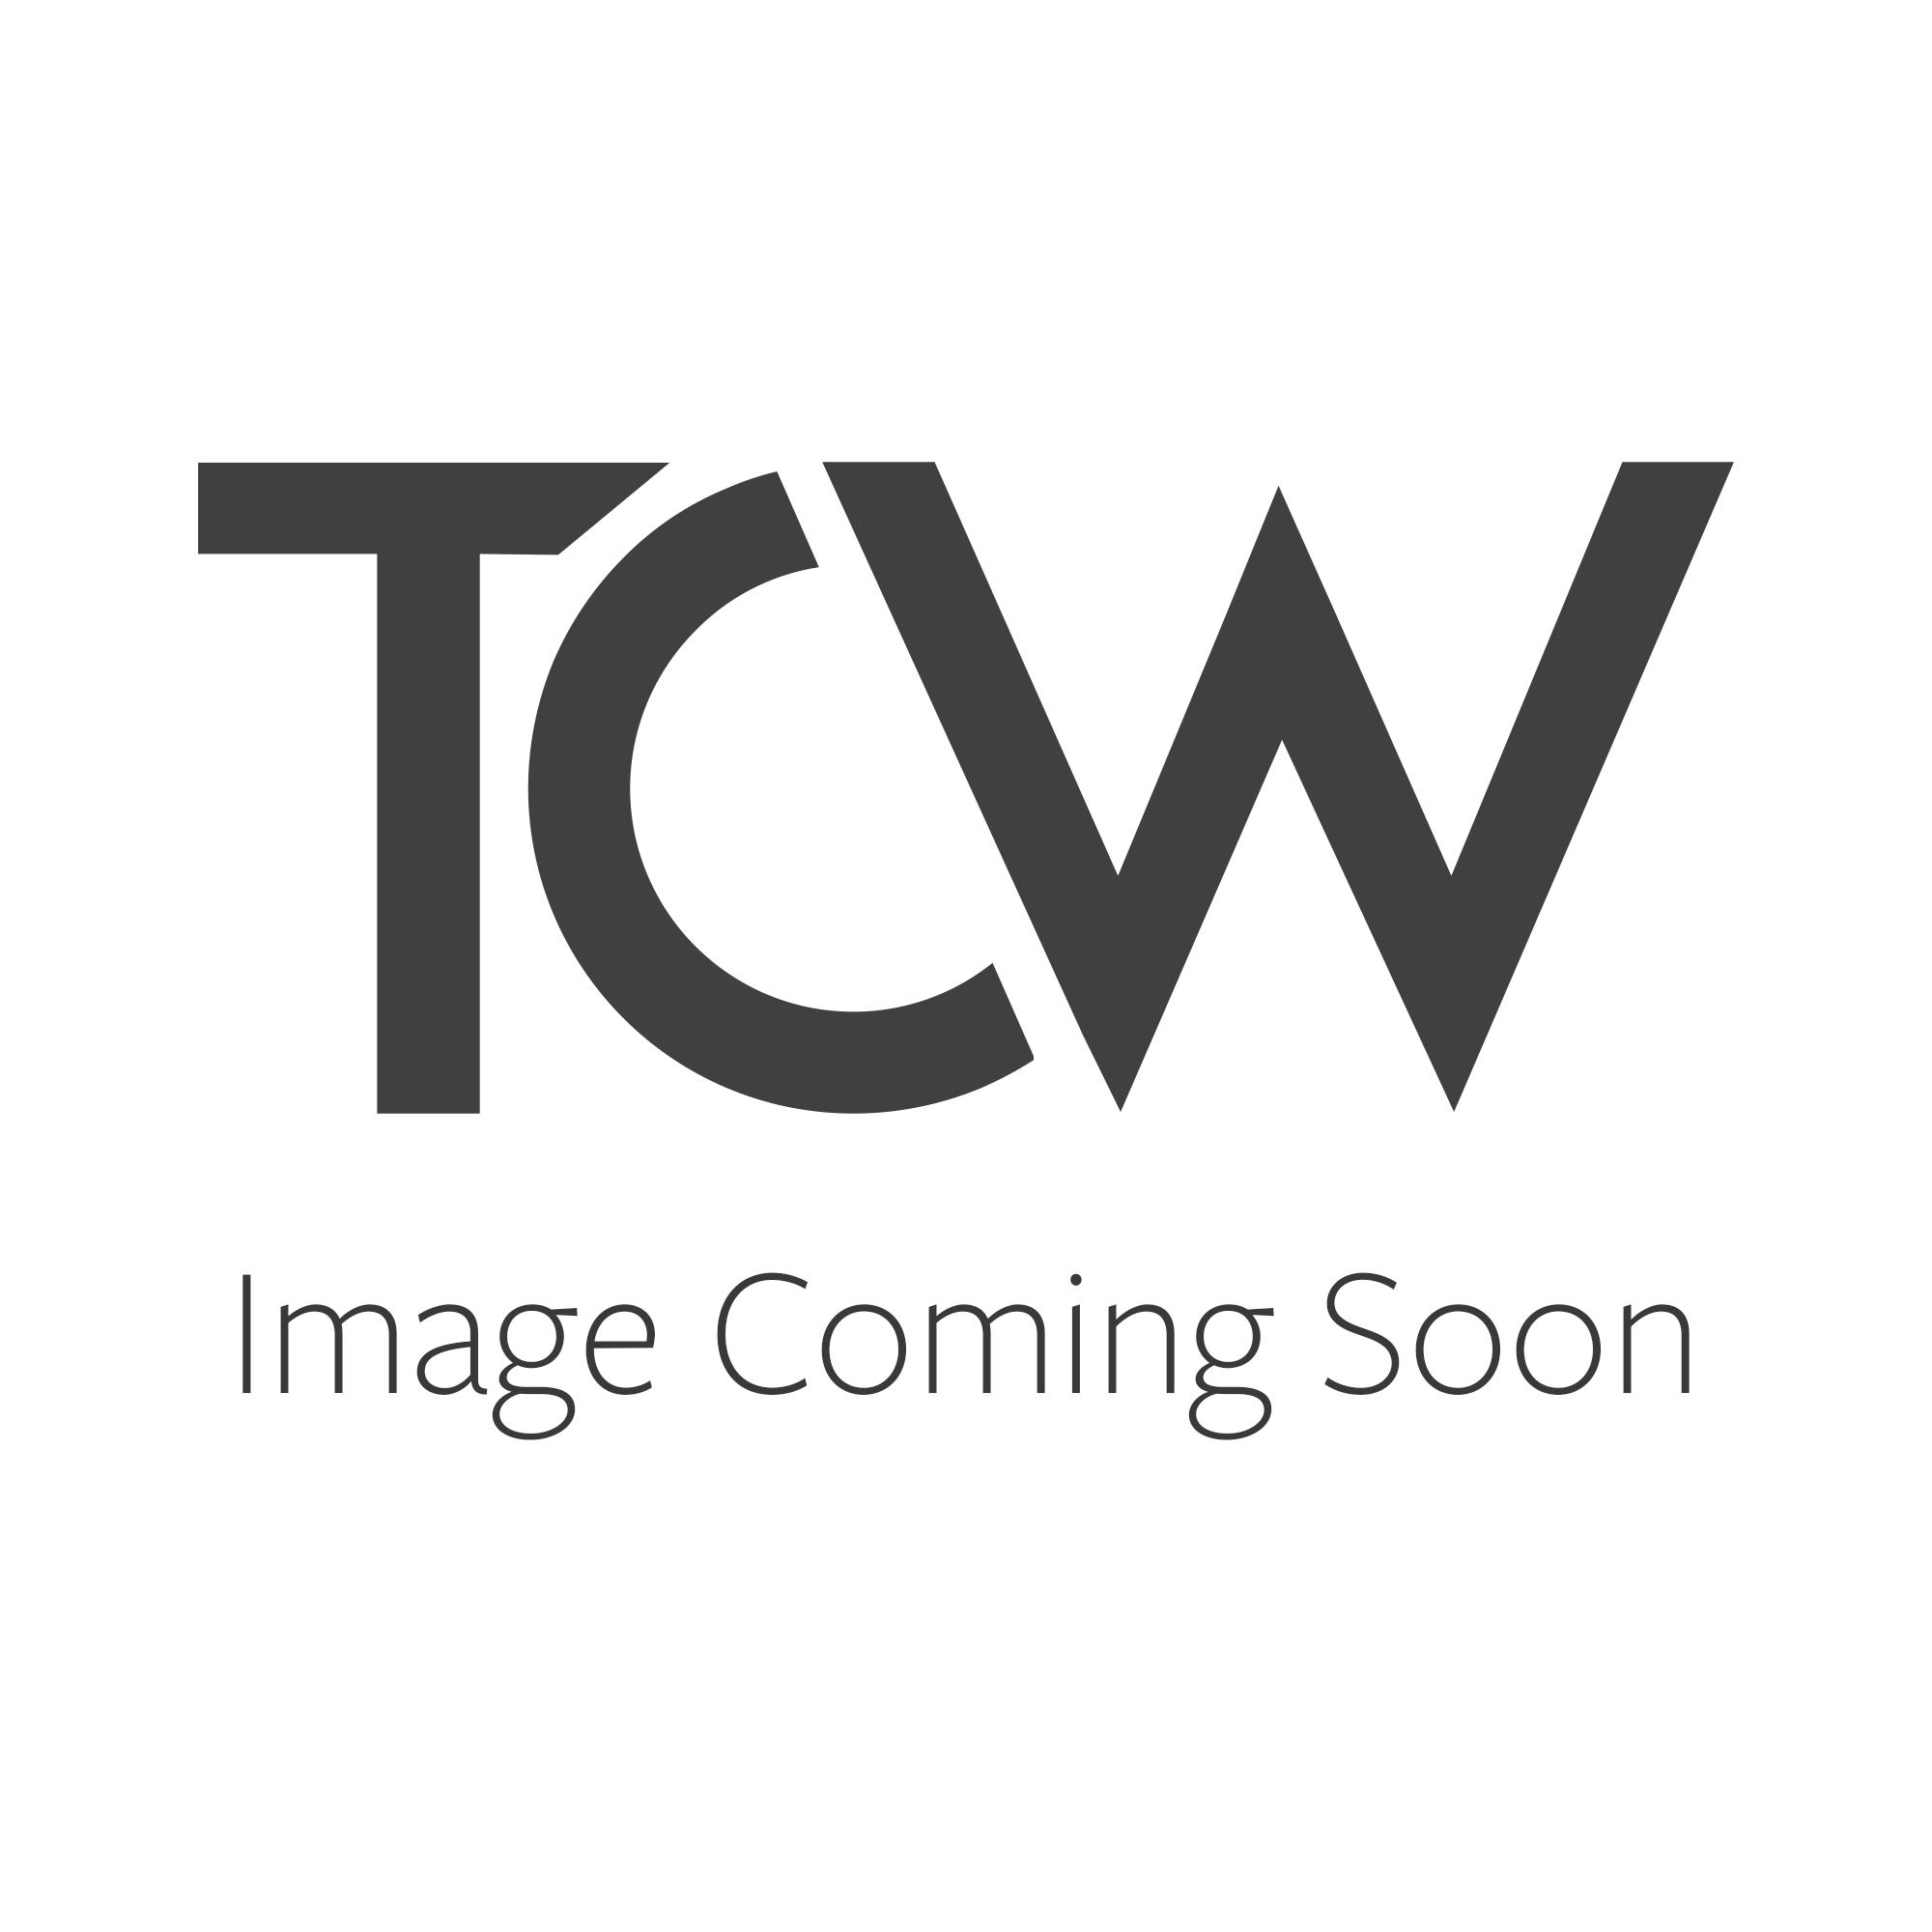 Image 10826.jpg?ixlib=rails 3.0